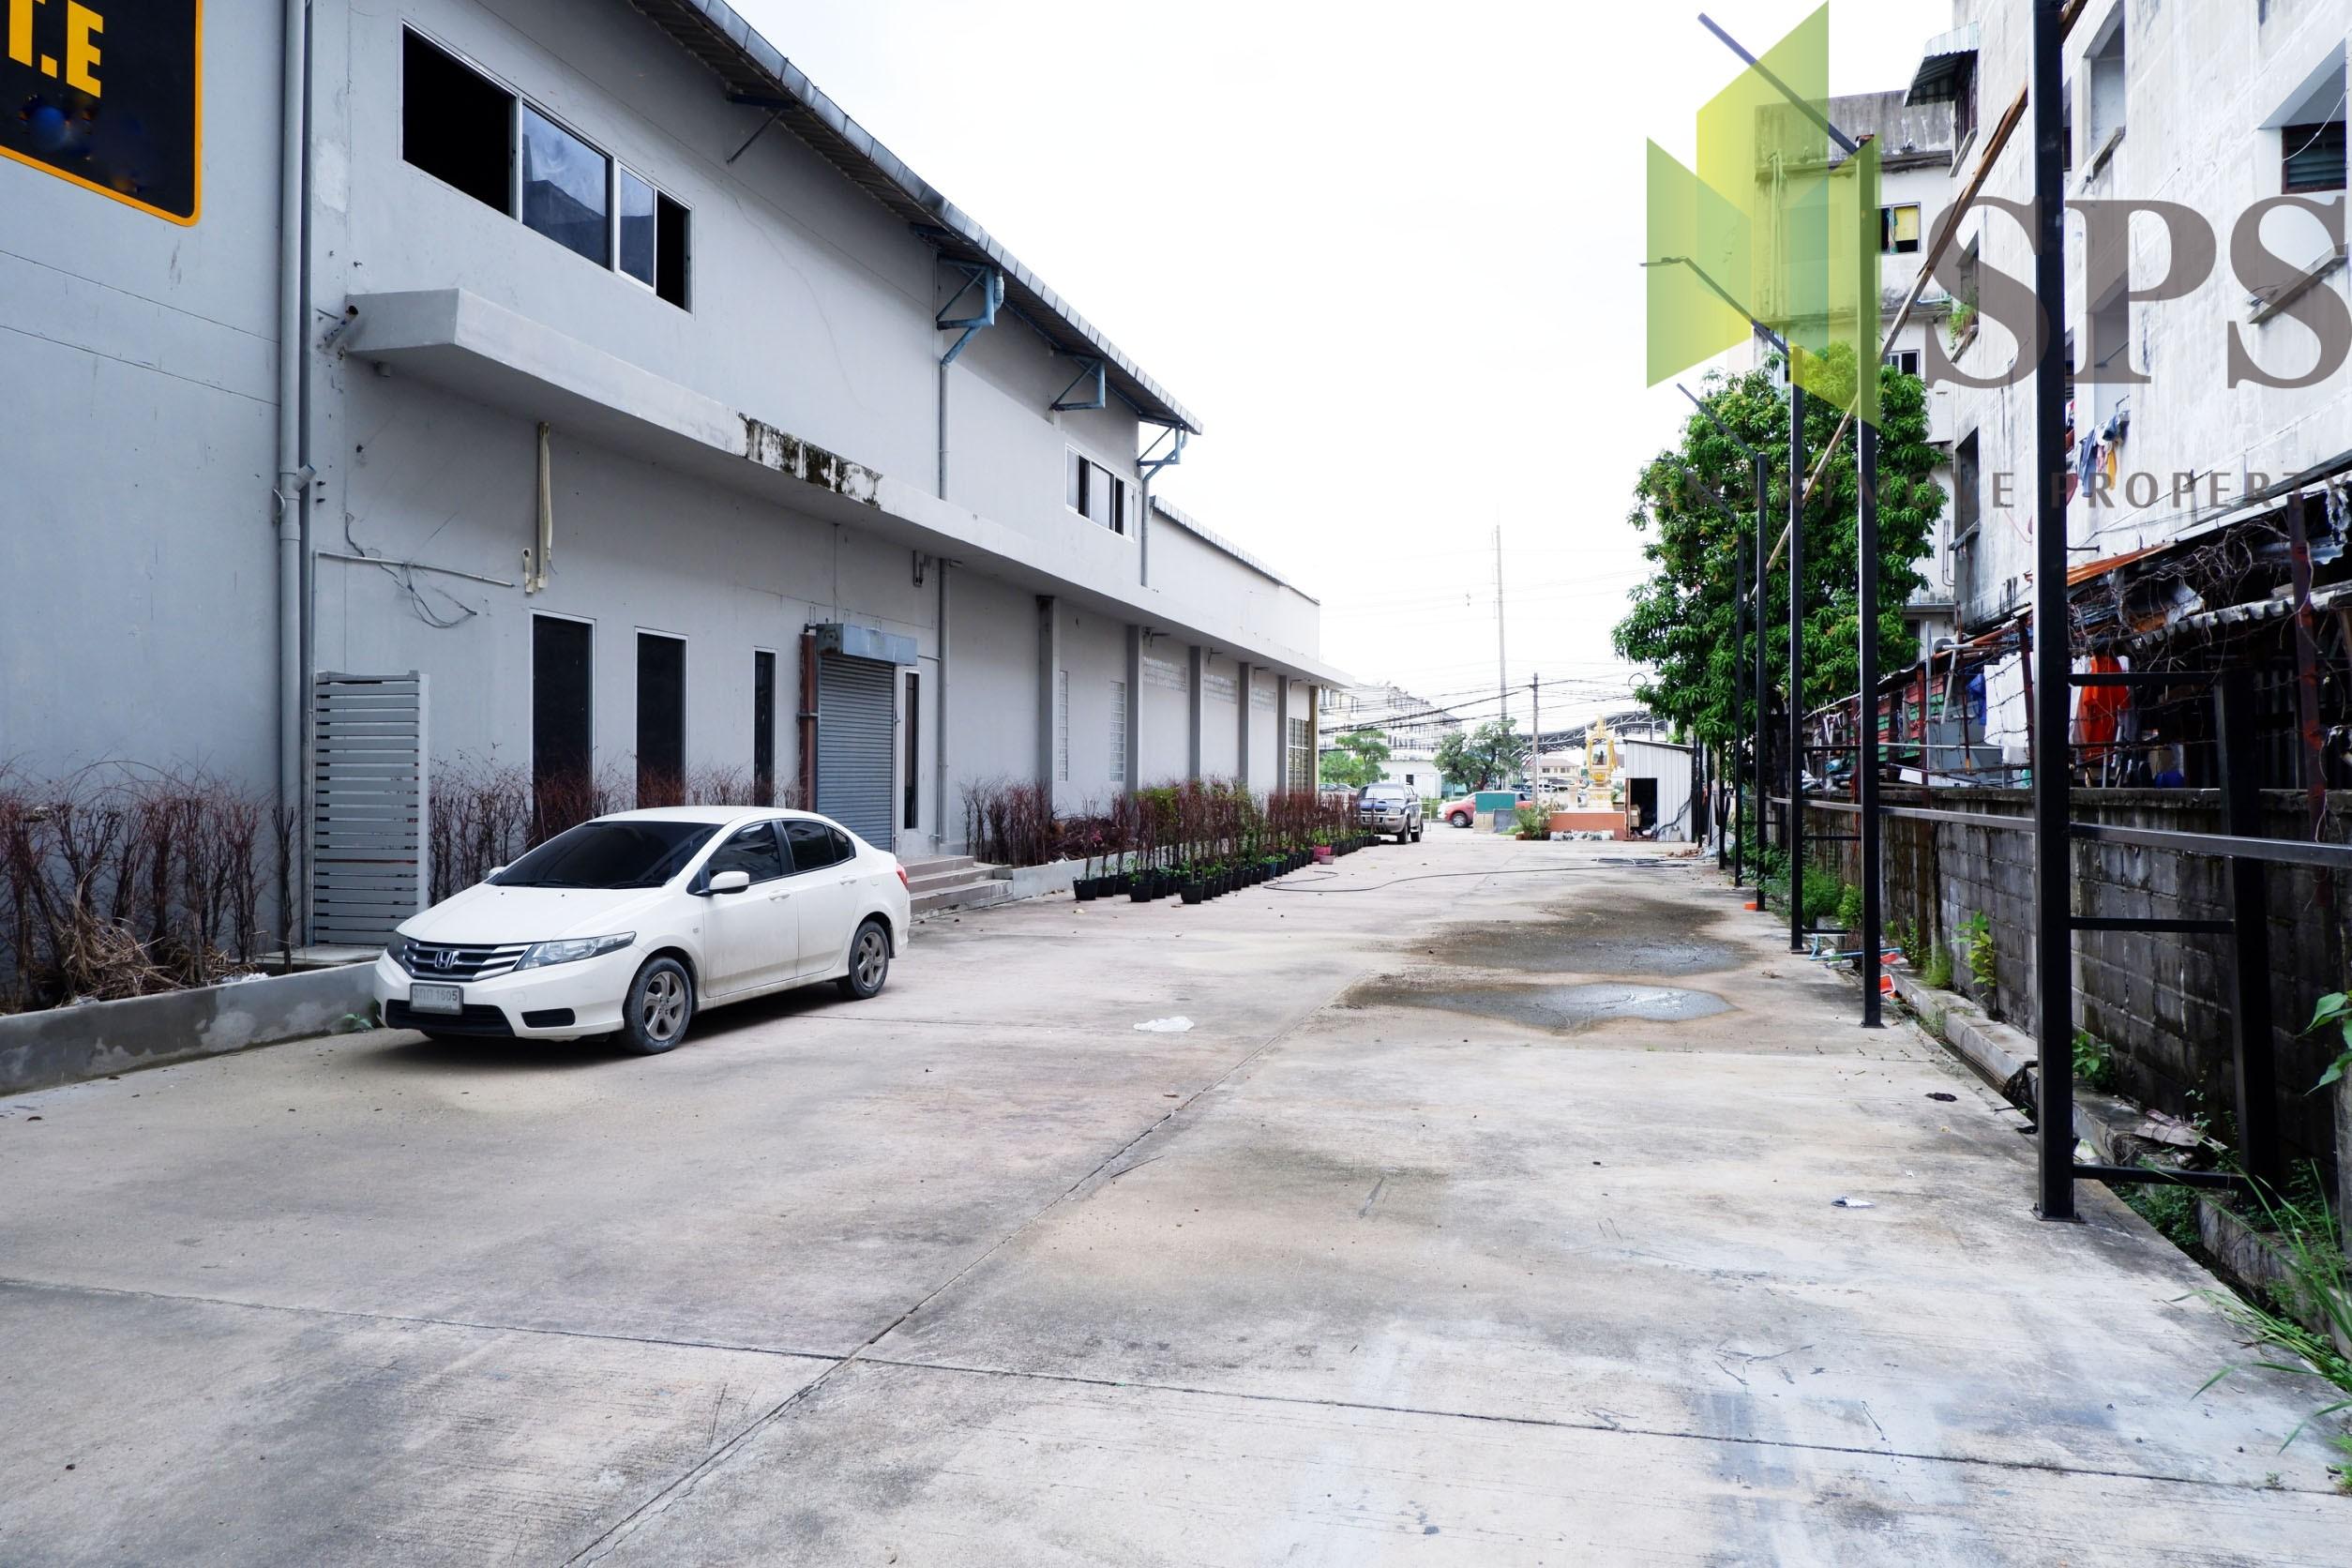 Warehouse For Rent คลังสินค้าให้เช่า ติดถนนศรีนครินทร์ เดินทางสะดวก(SPS-PPW132)